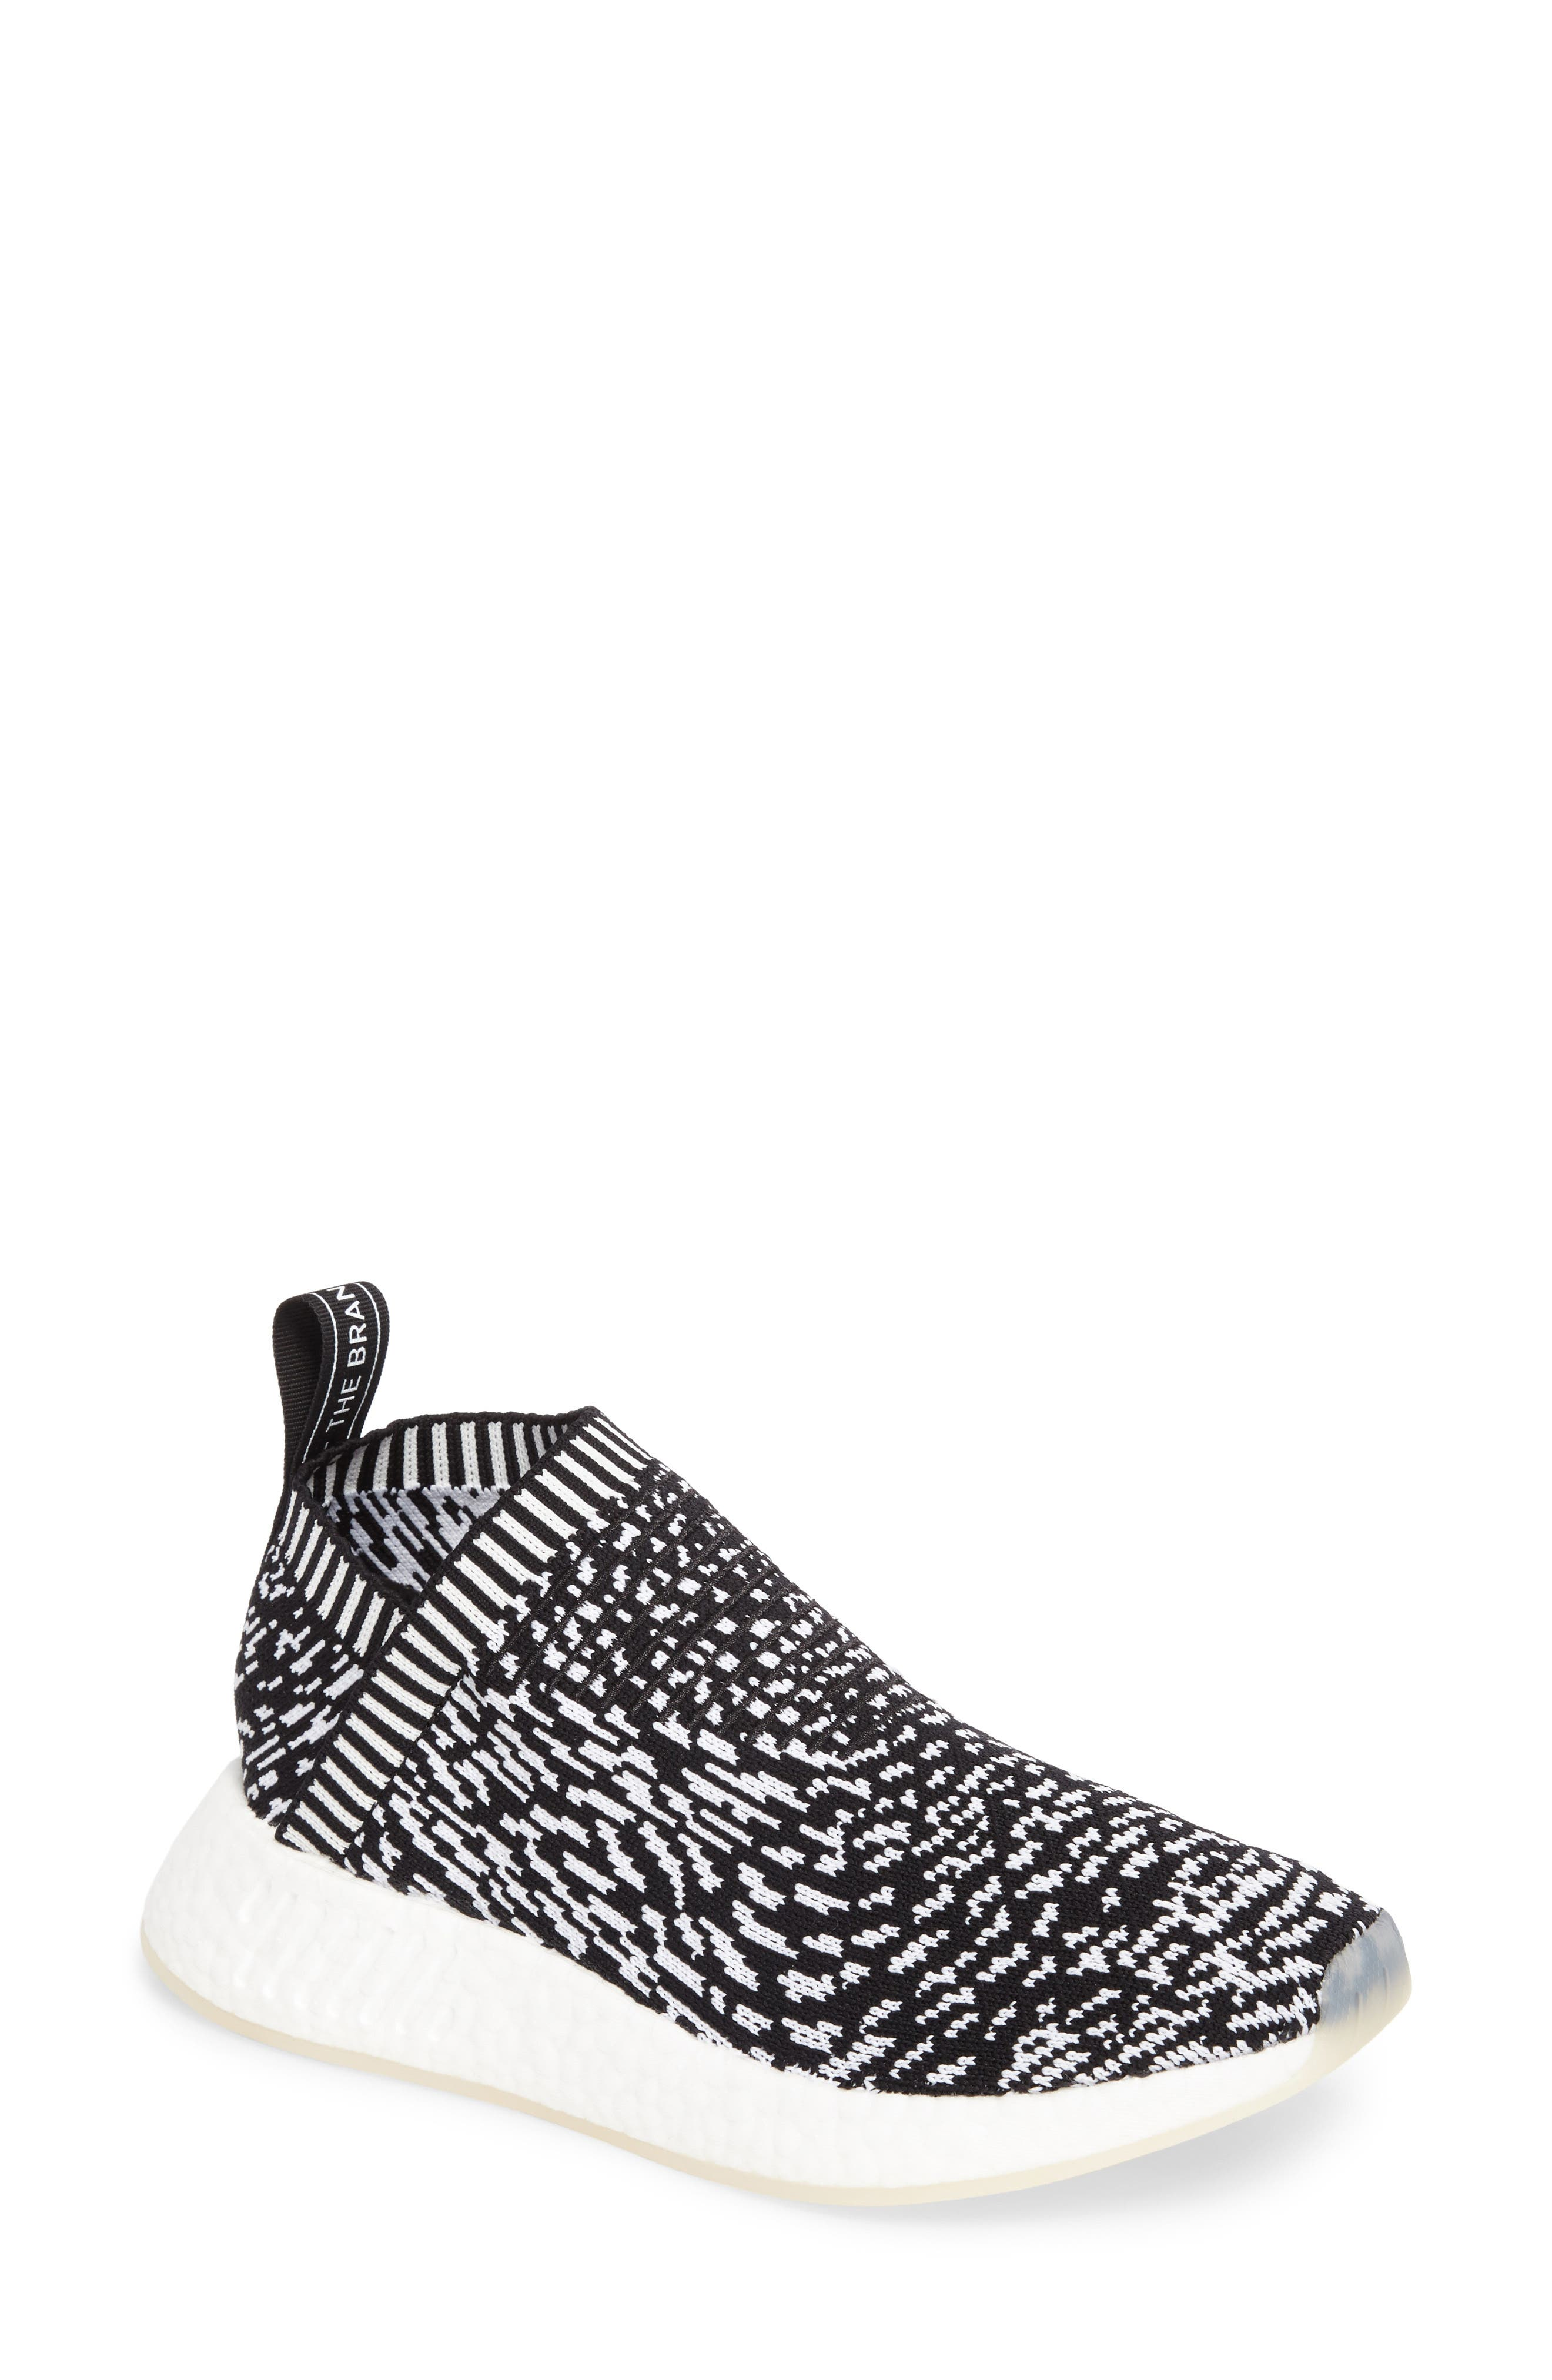 adidas NMD_CS2 Primeknit Sneaker (Women)